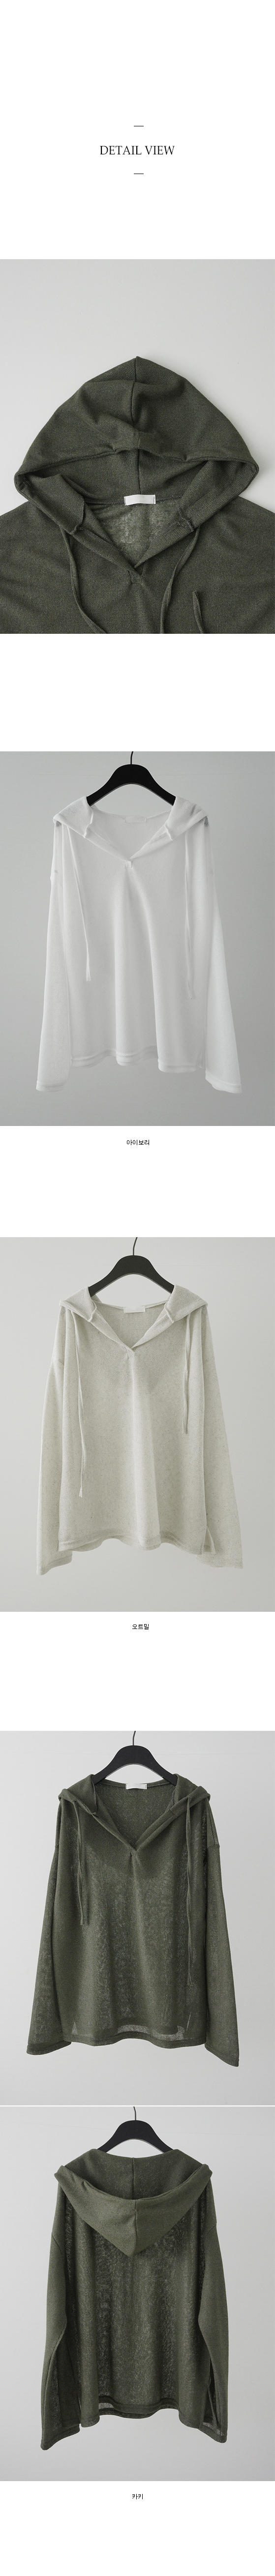 natural mood mesh hood top